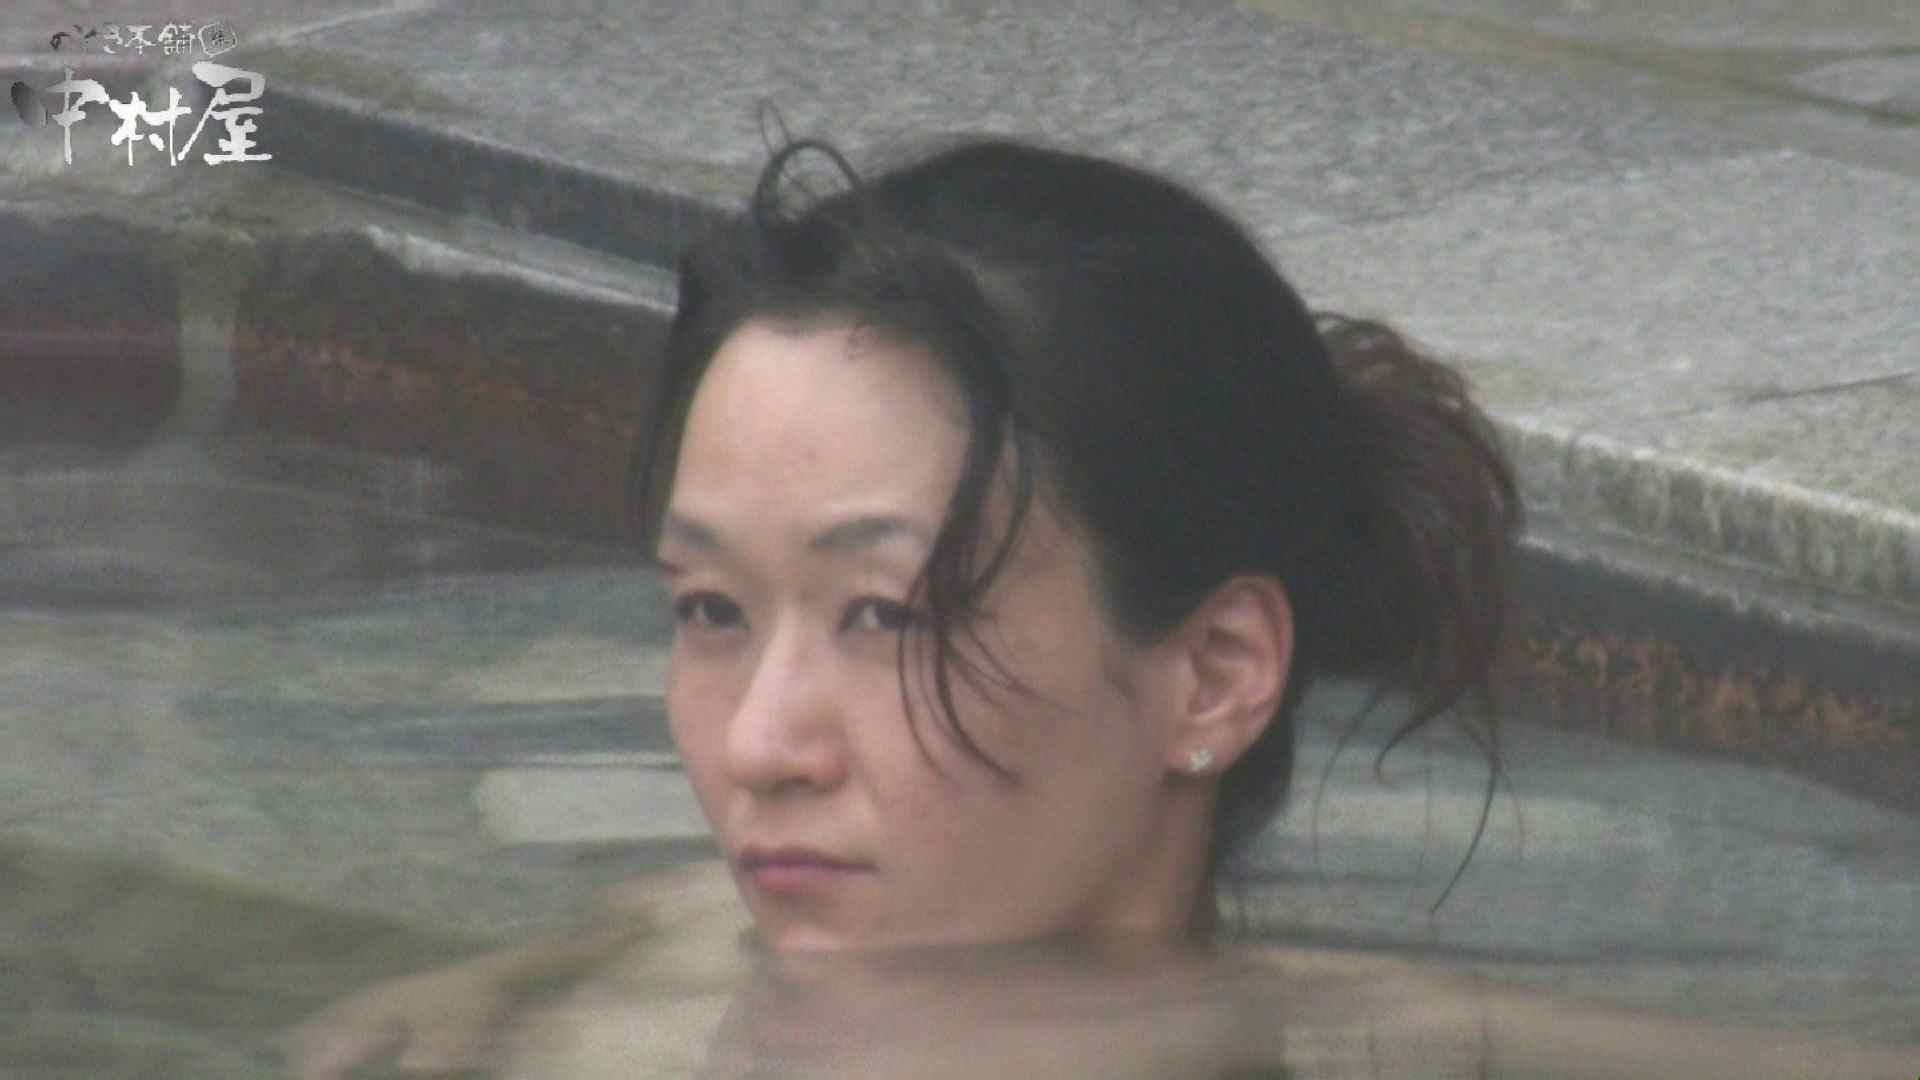 Aquaな露天風呂Vol.928 OLセックス | 盗撮  99画像 79